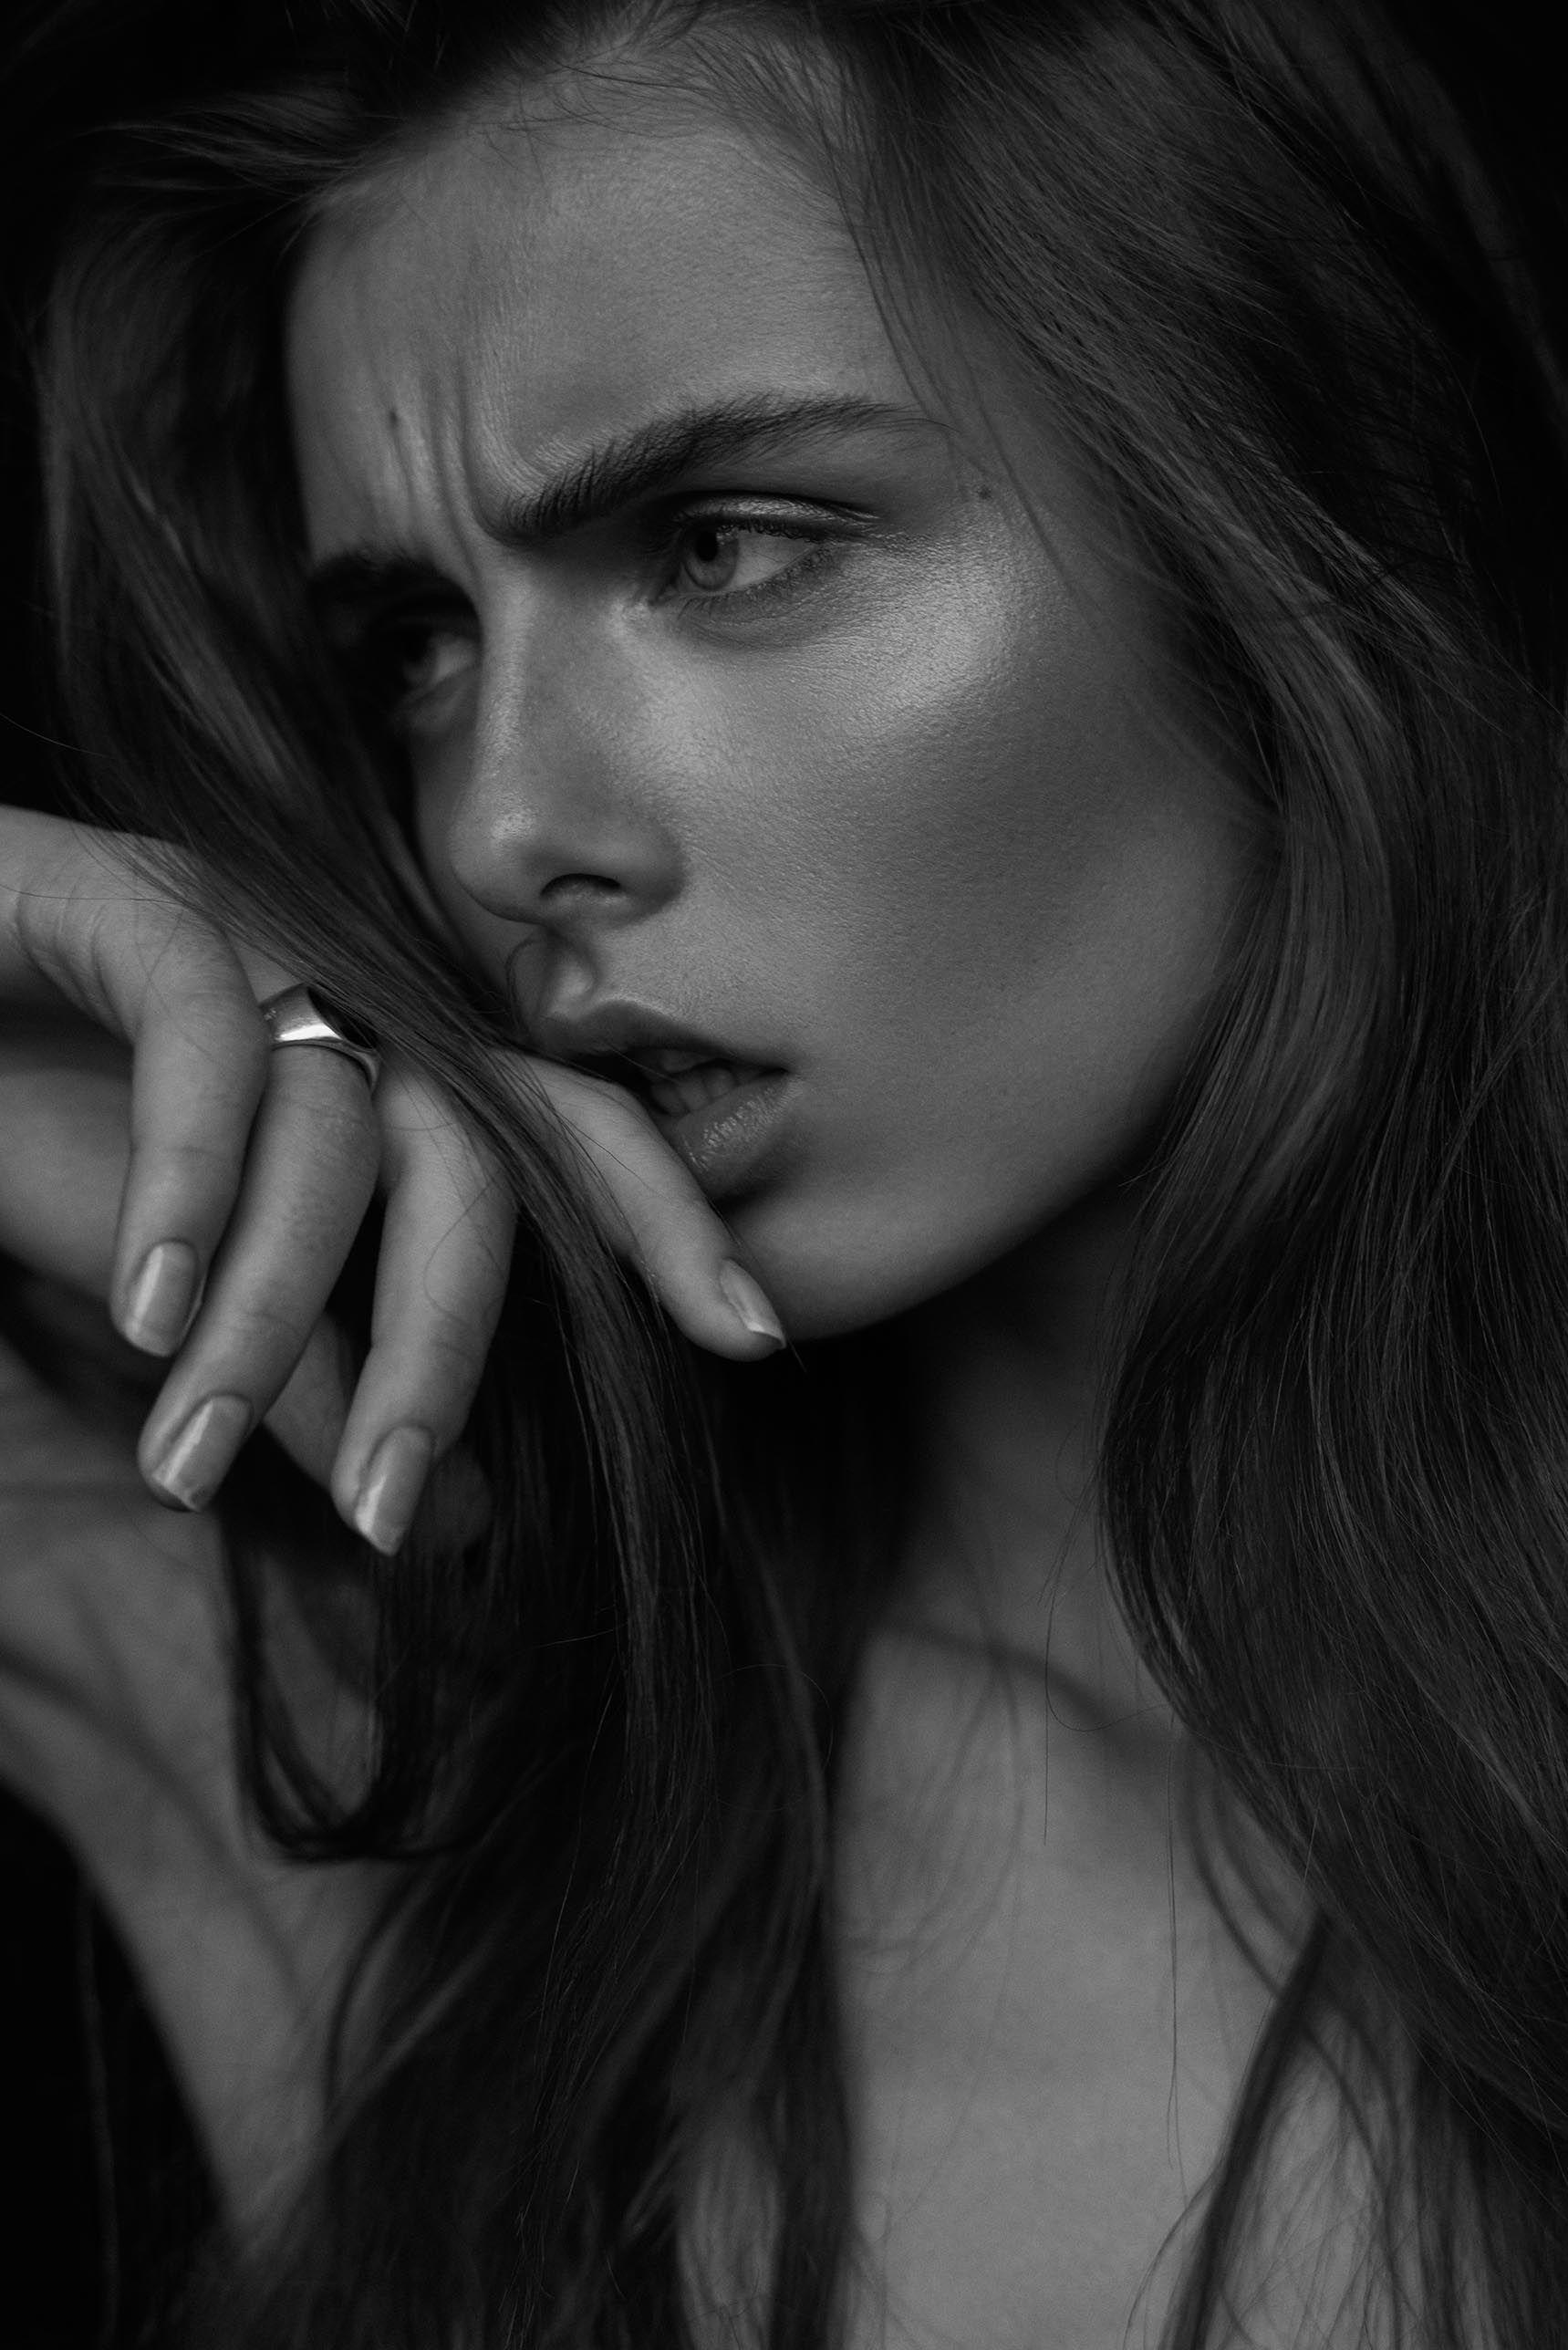 Anastasiya Jepsen nude (43 foto), Is a cute Selfie, YouTube, lingerie 2019